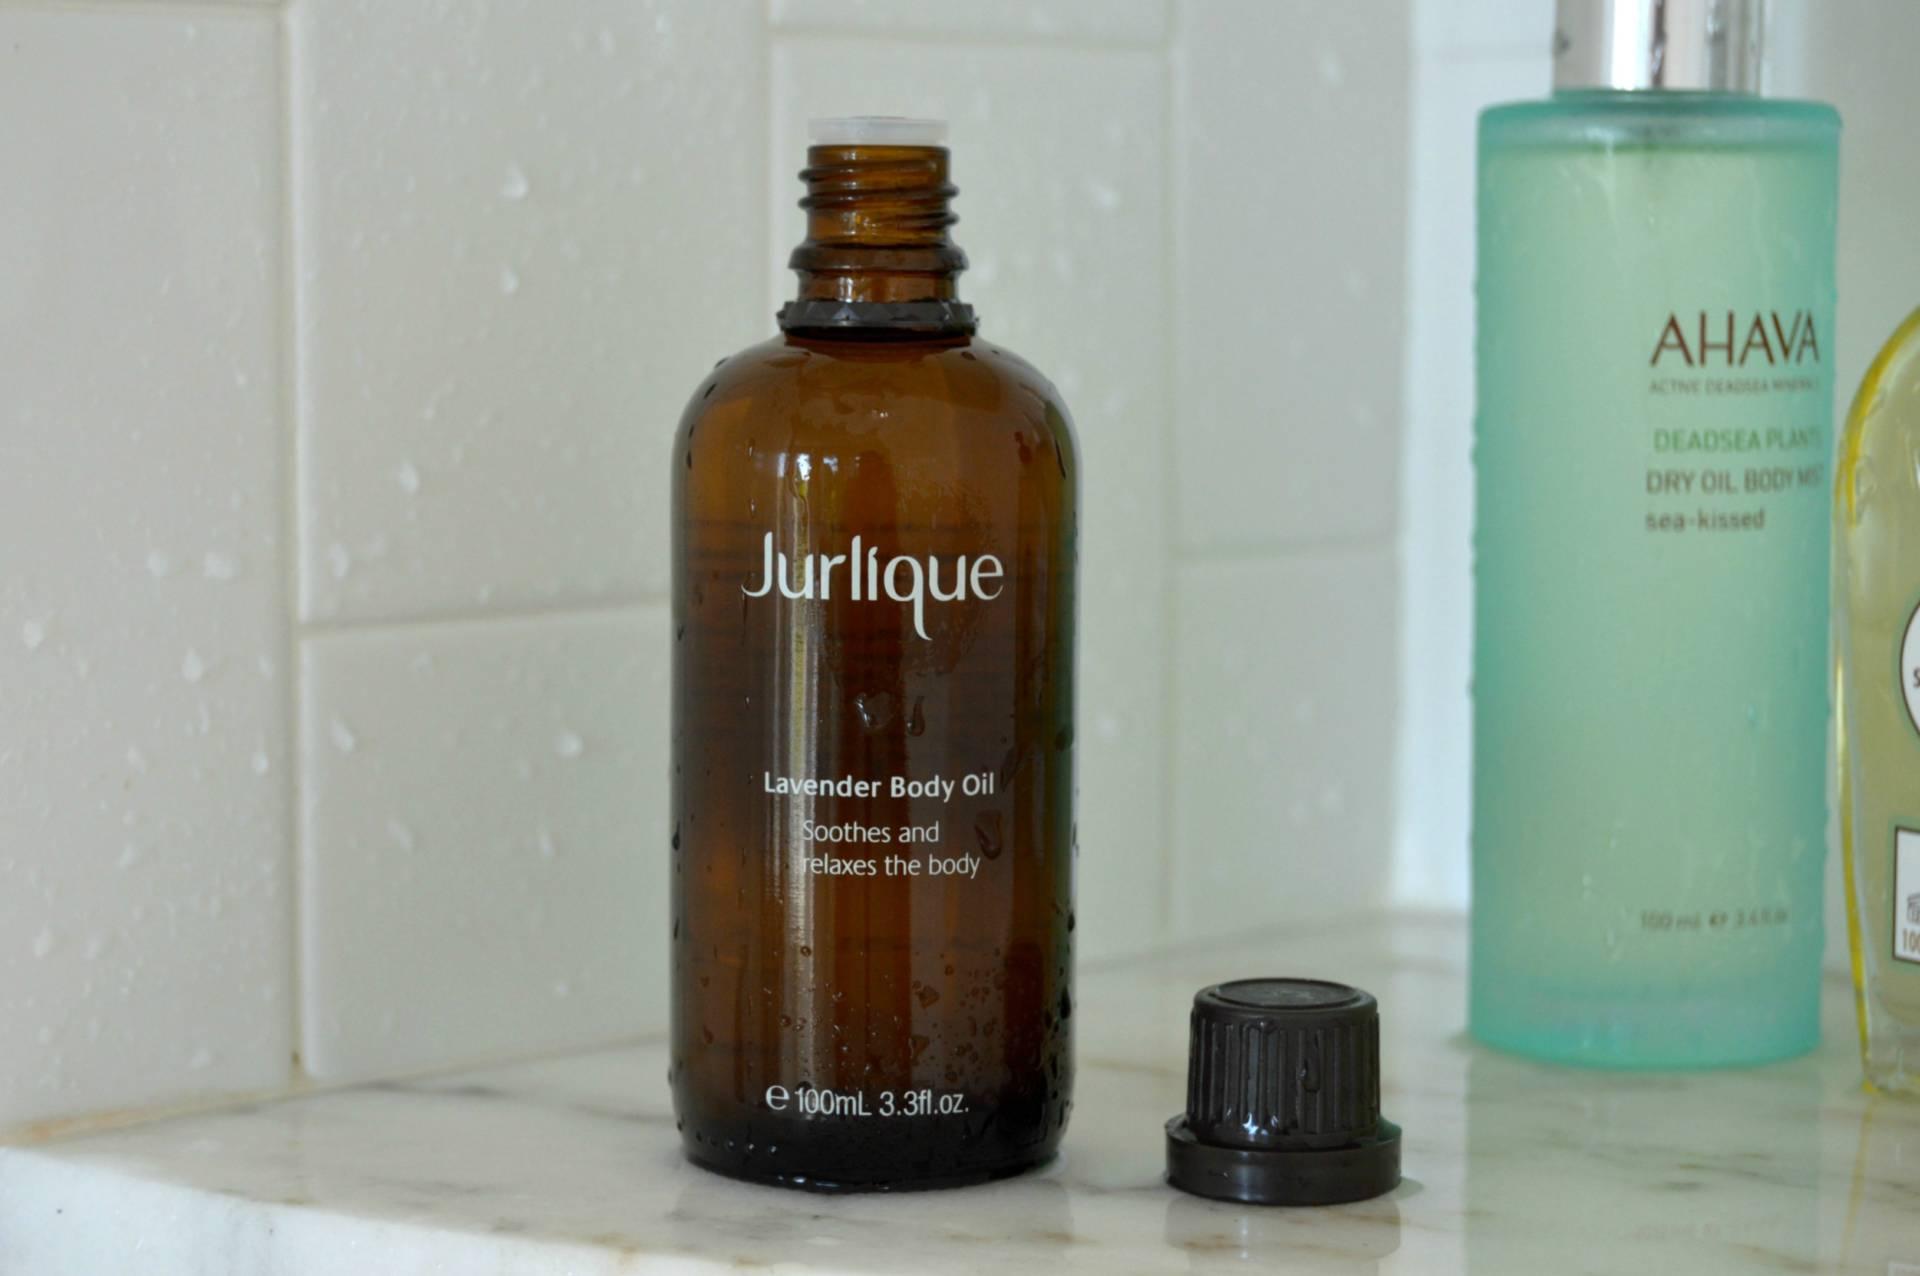 body oil edit jurlique soothing relaxing lavender review inhautepursuit